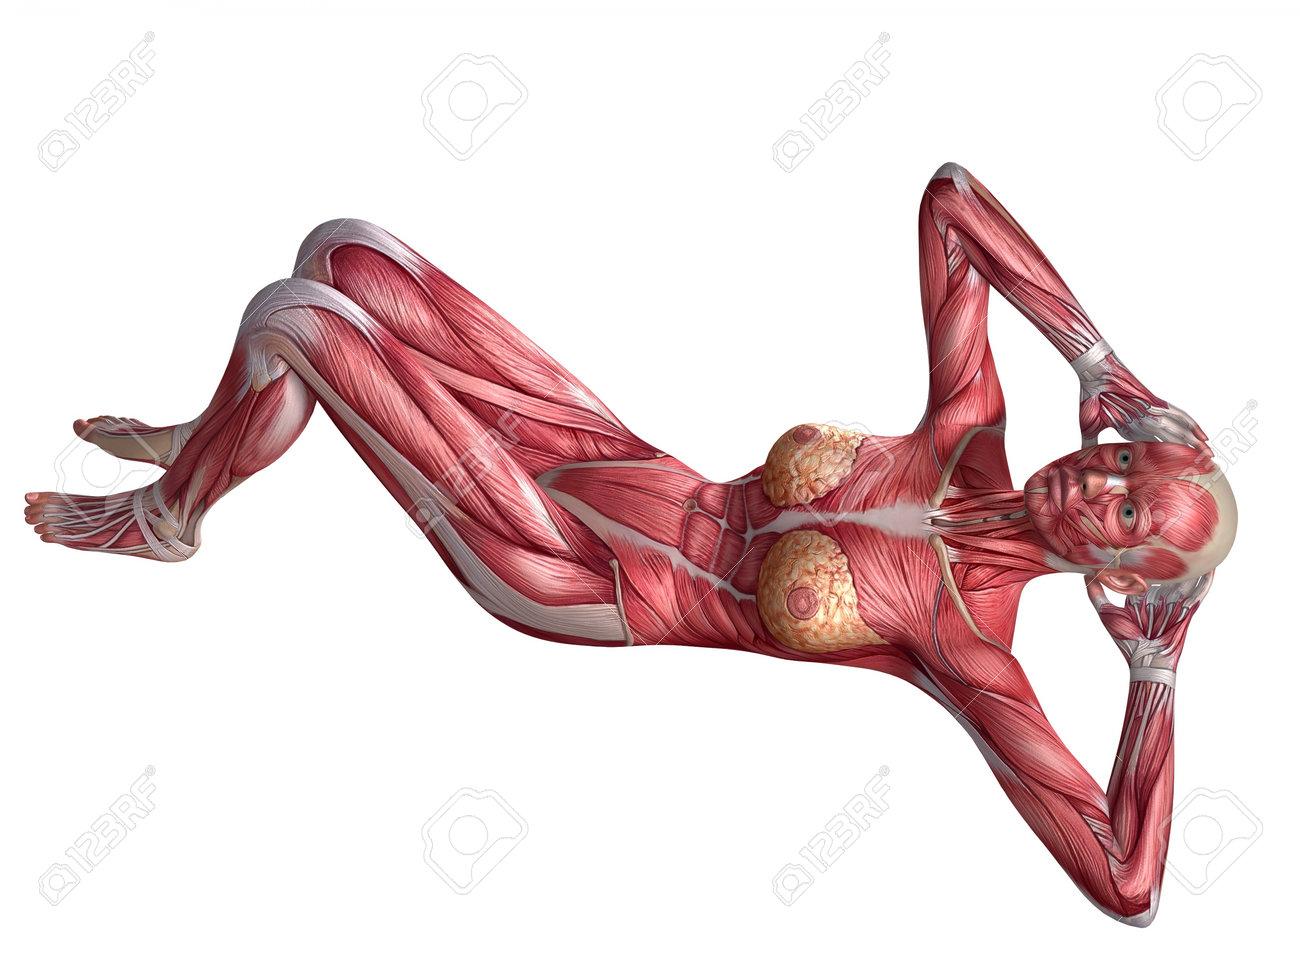 Anatomy Of Abs Gallery - human body anatomy